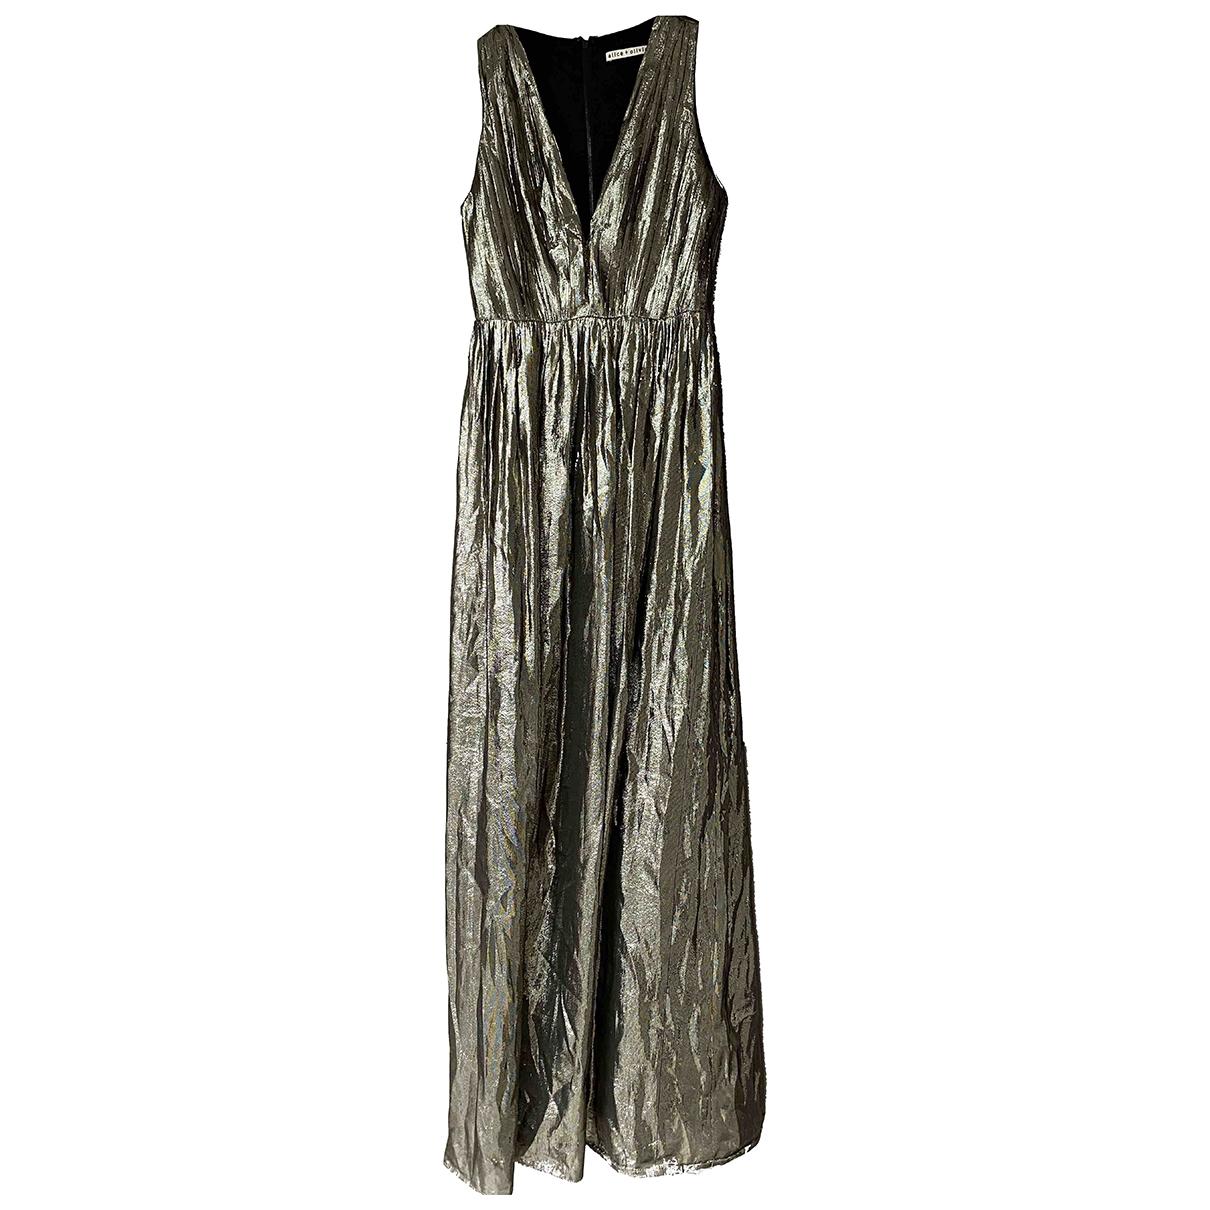 Alice & Olivia \N Gold dress for Women 2 US